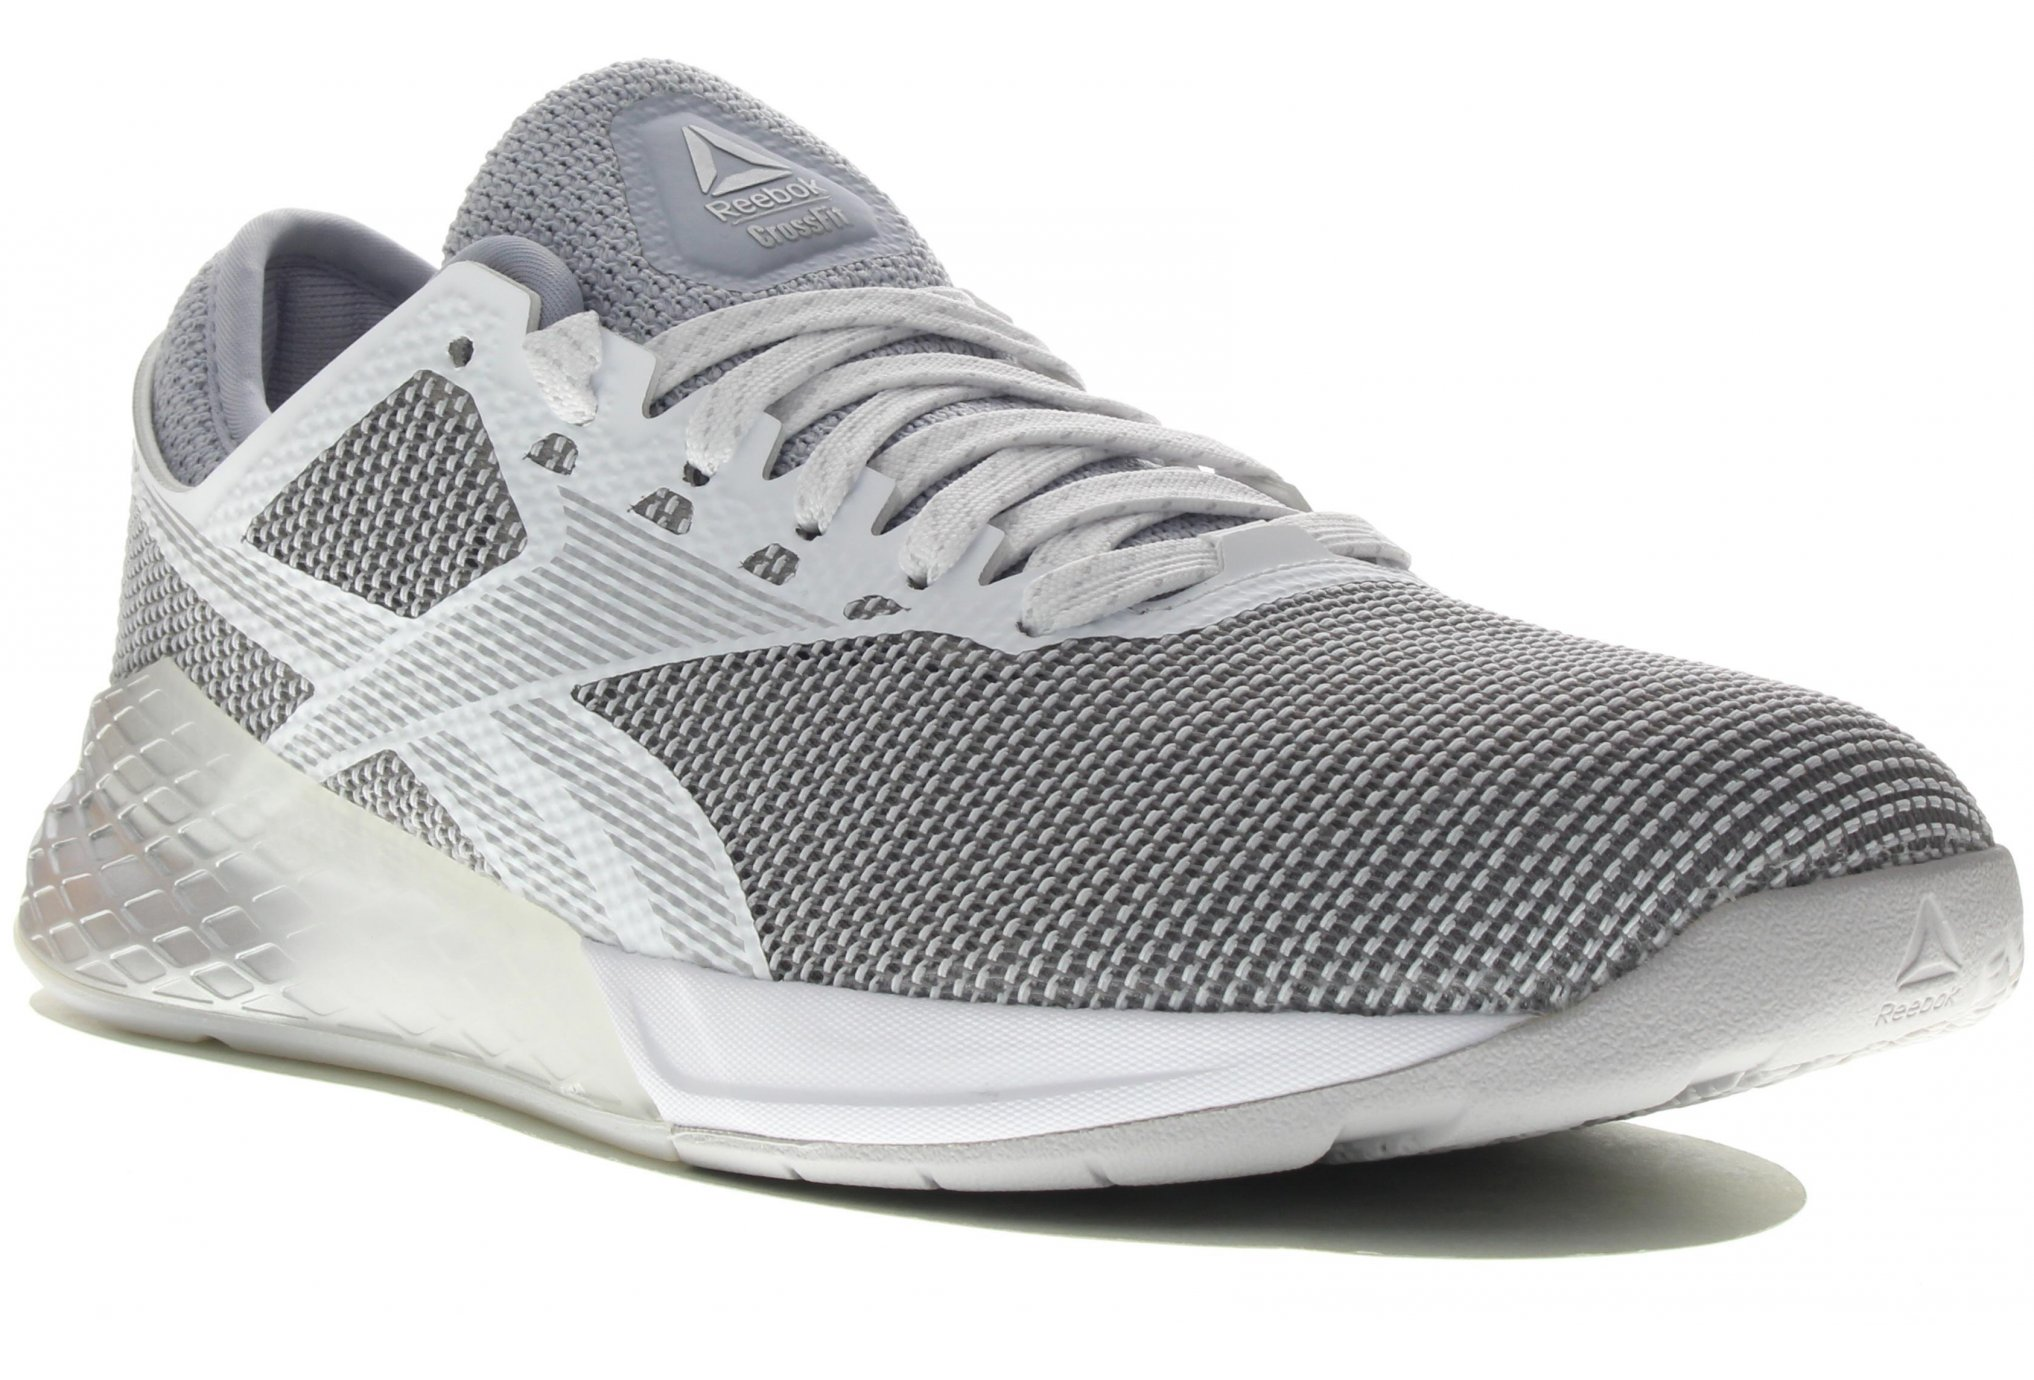 Reebok Nano 9 W Chaussures running femme